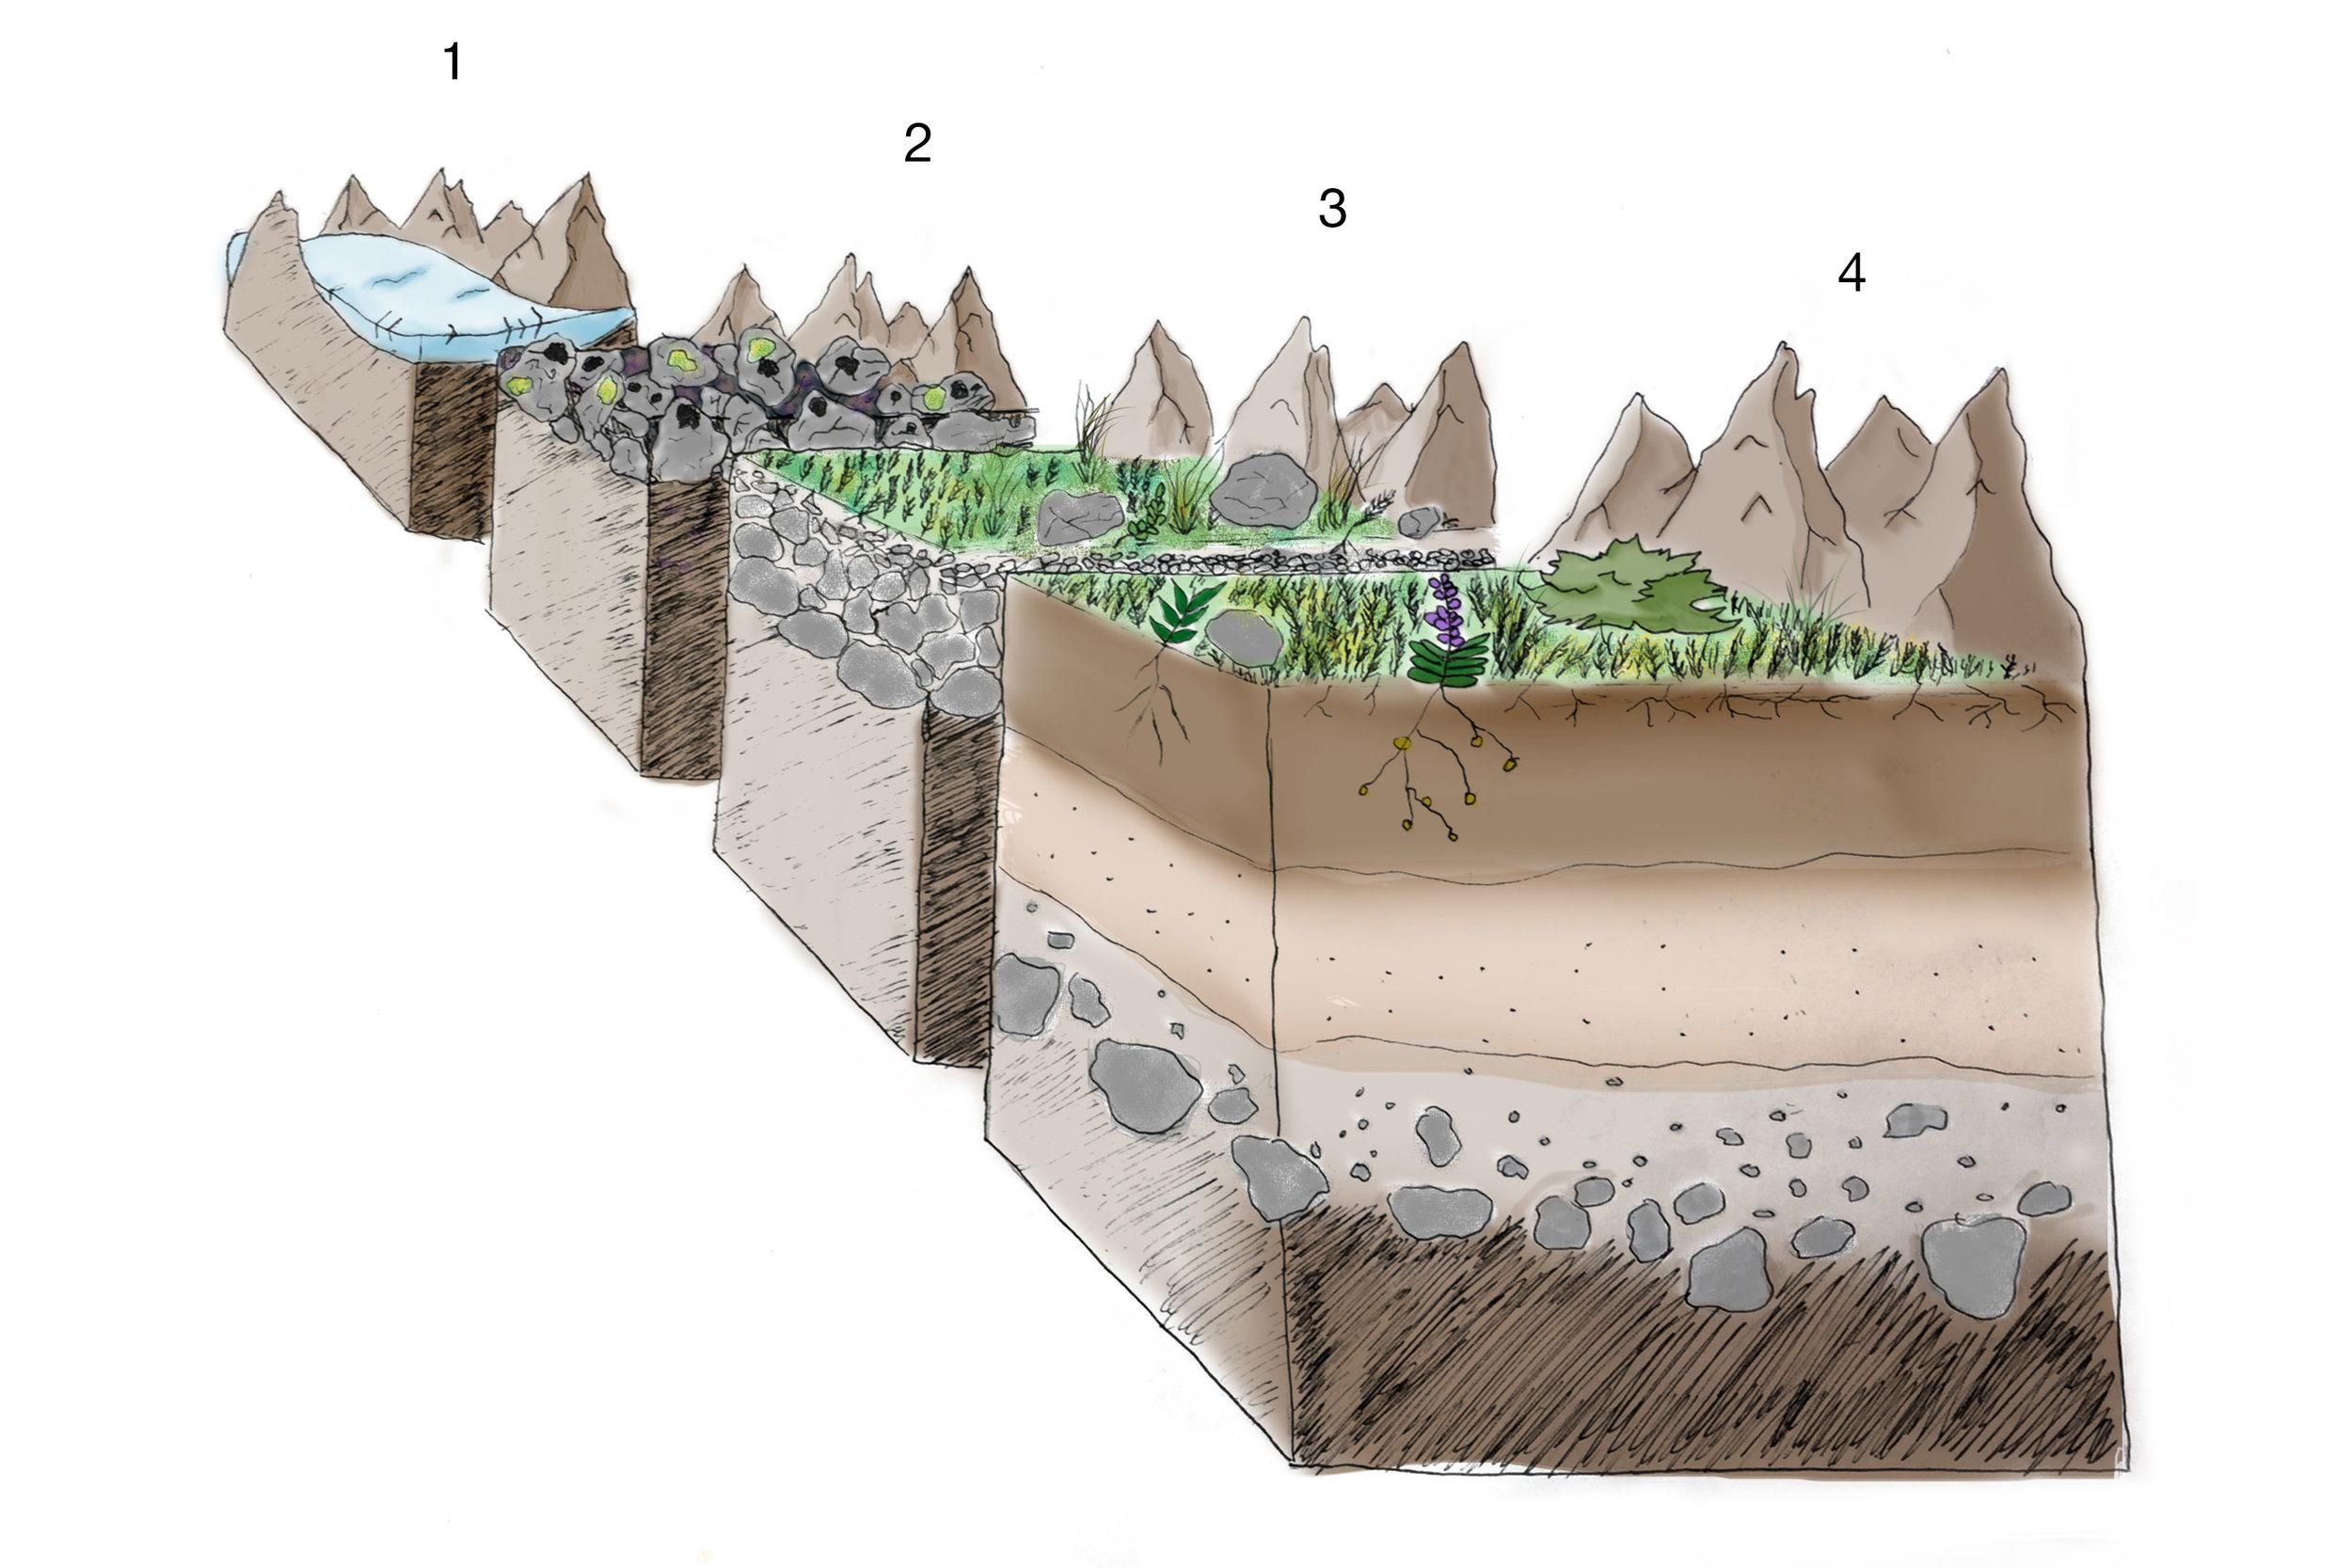 Plant succession and soil development in progressively deglaciated zones. Image credit: Abby Case.